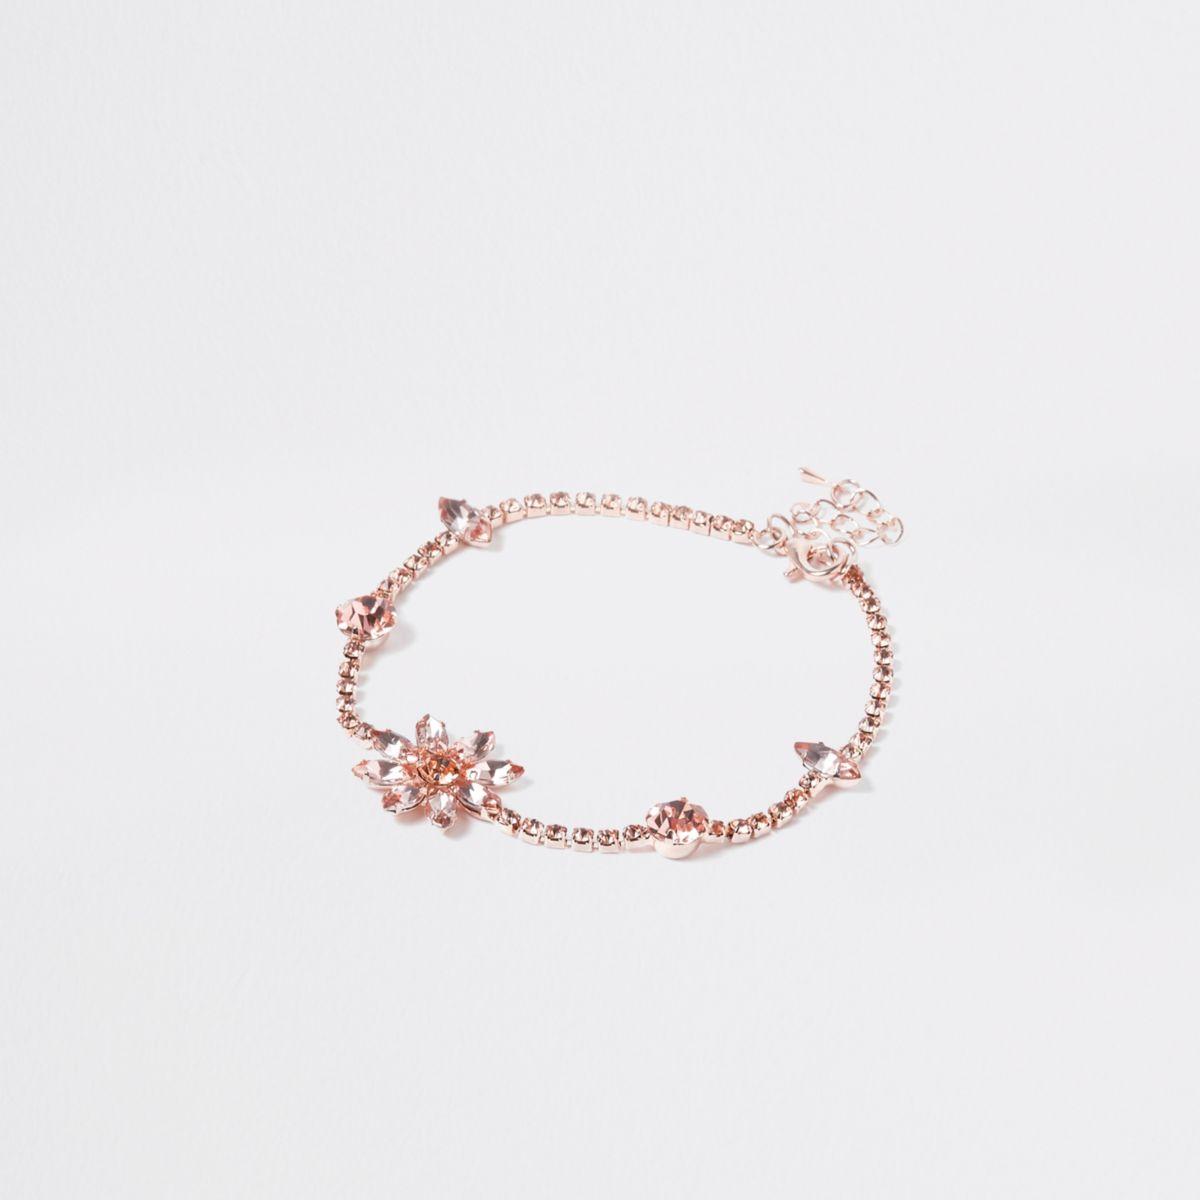 Rose gold tone diamante anklet